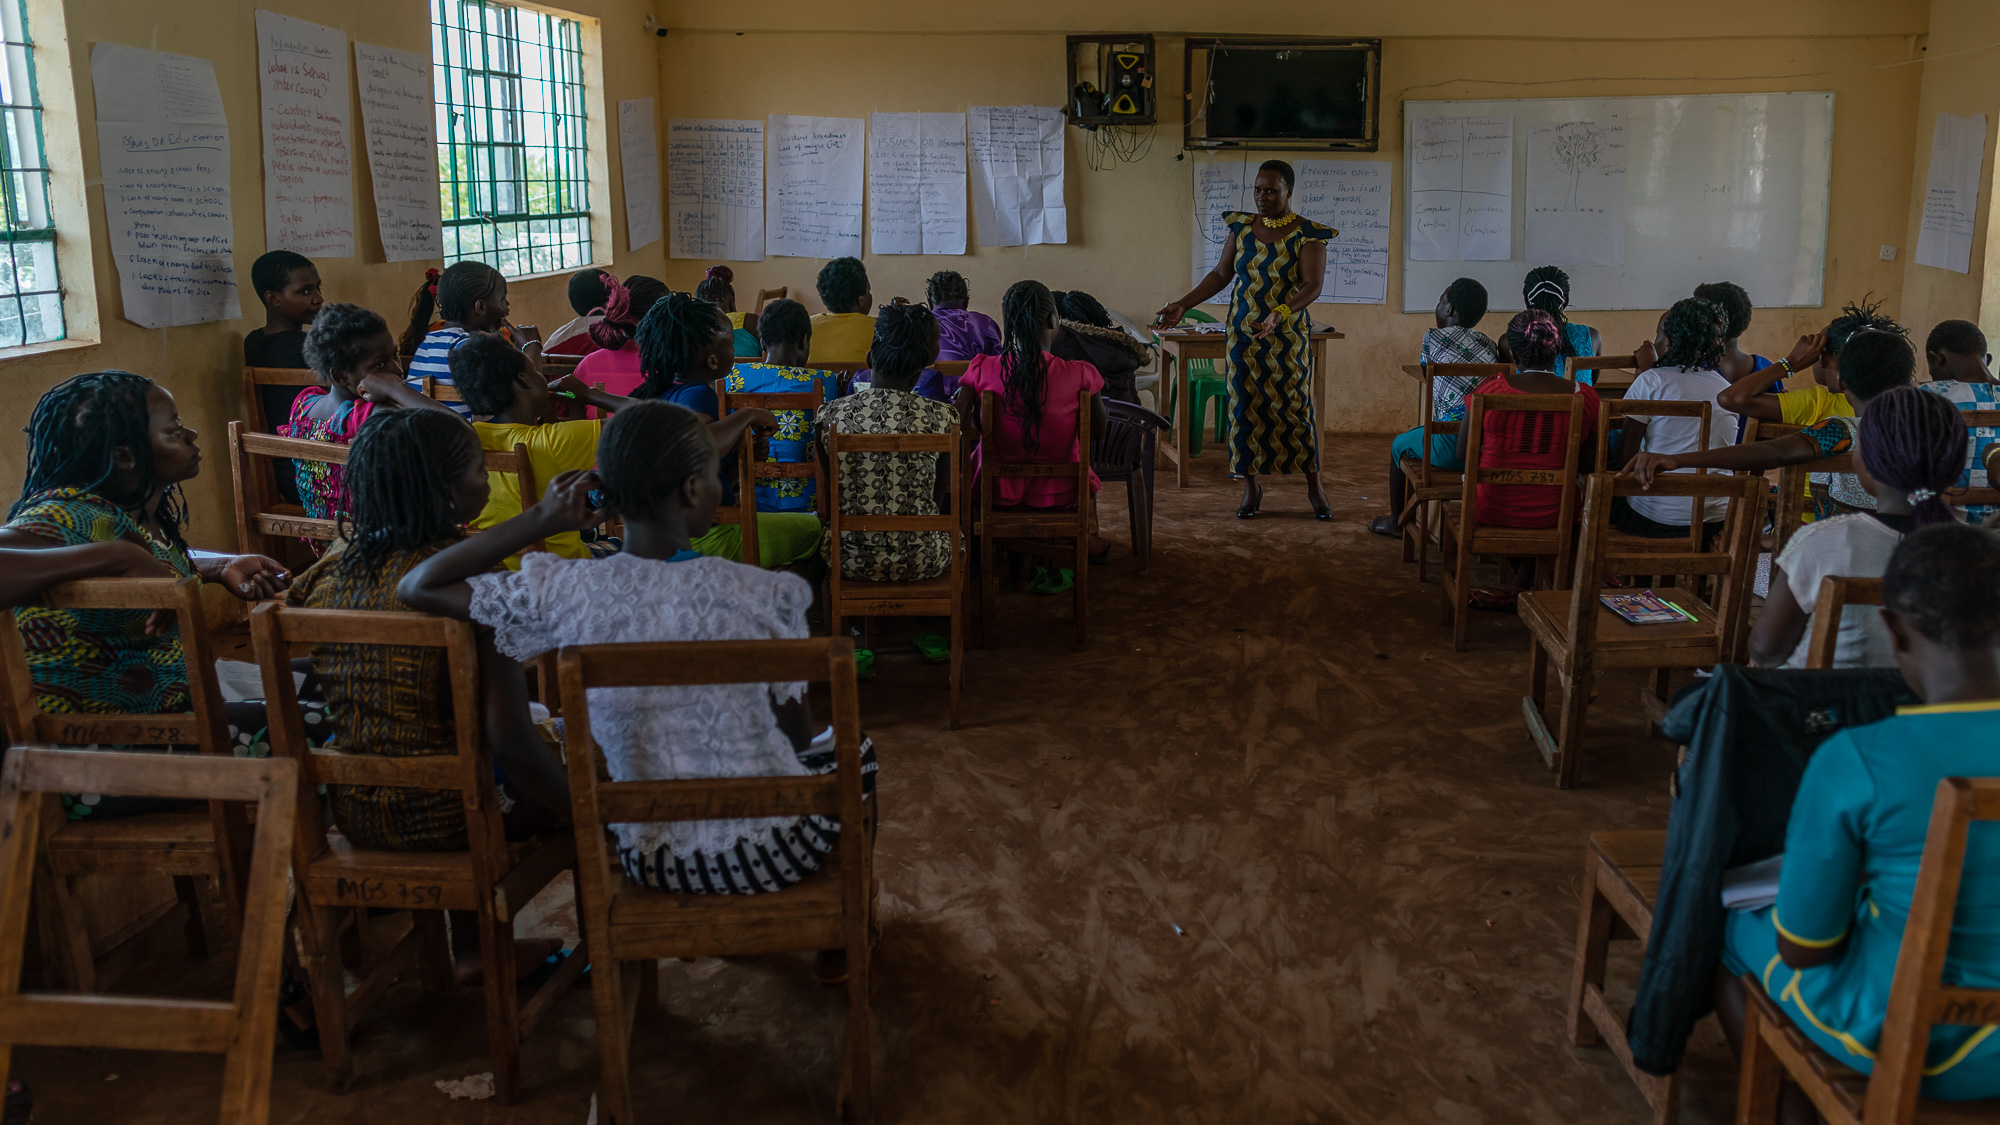 Adolescent girls attend week long workshops as part of an Altern